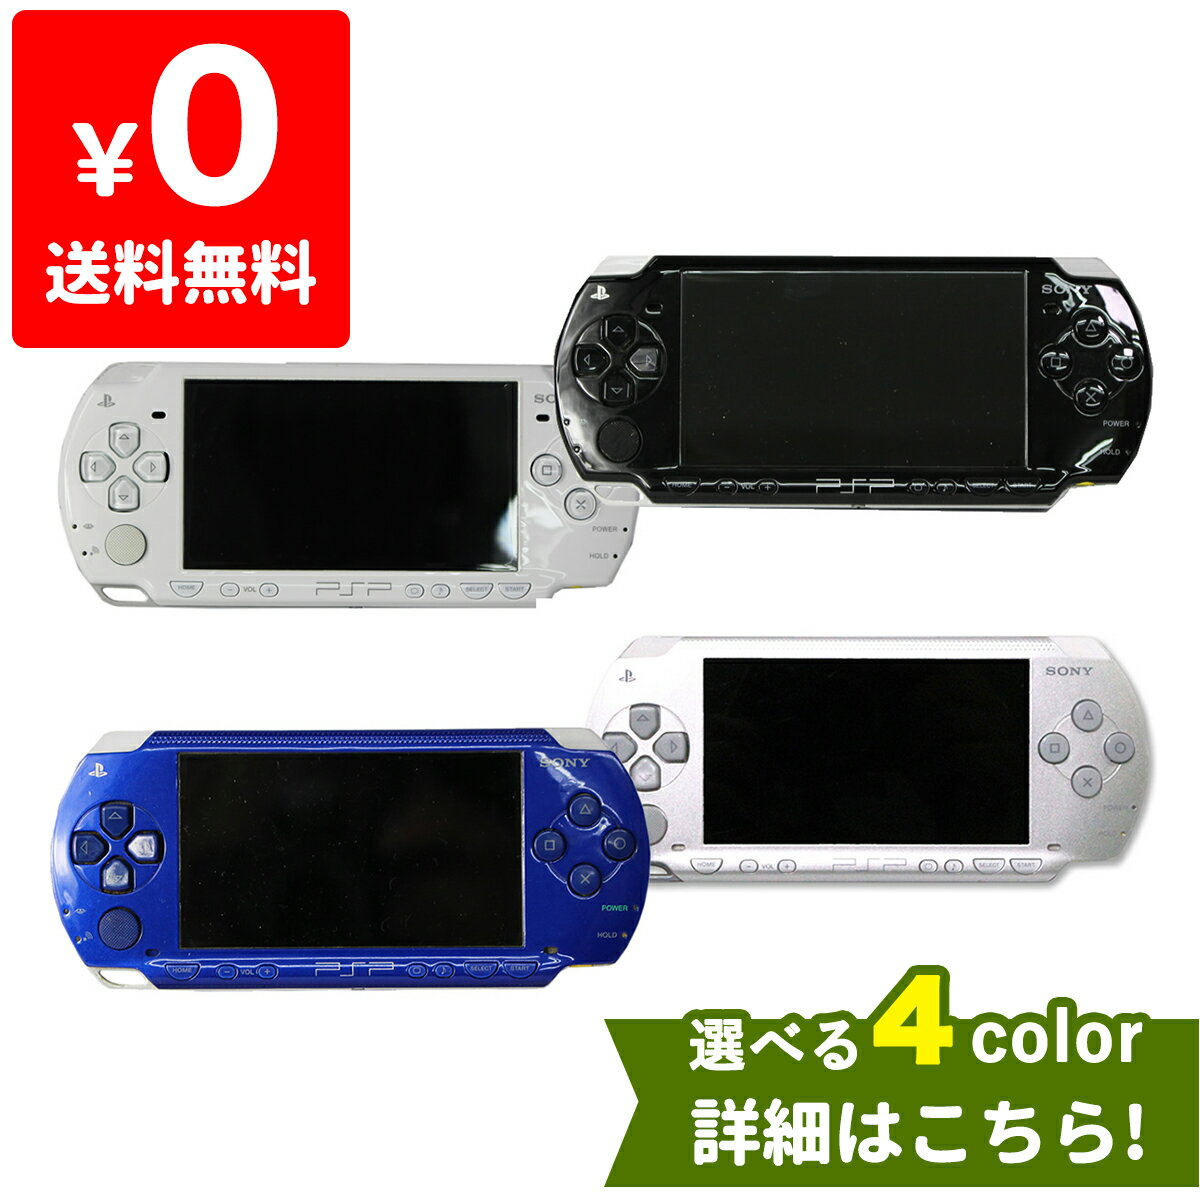 PSP-1000 プレイステーション・ポータブル 本体 すぐ遊べるセット 選べる4色 PlayStationPortable SONY ソニー 中古 4948872410670 送料無料